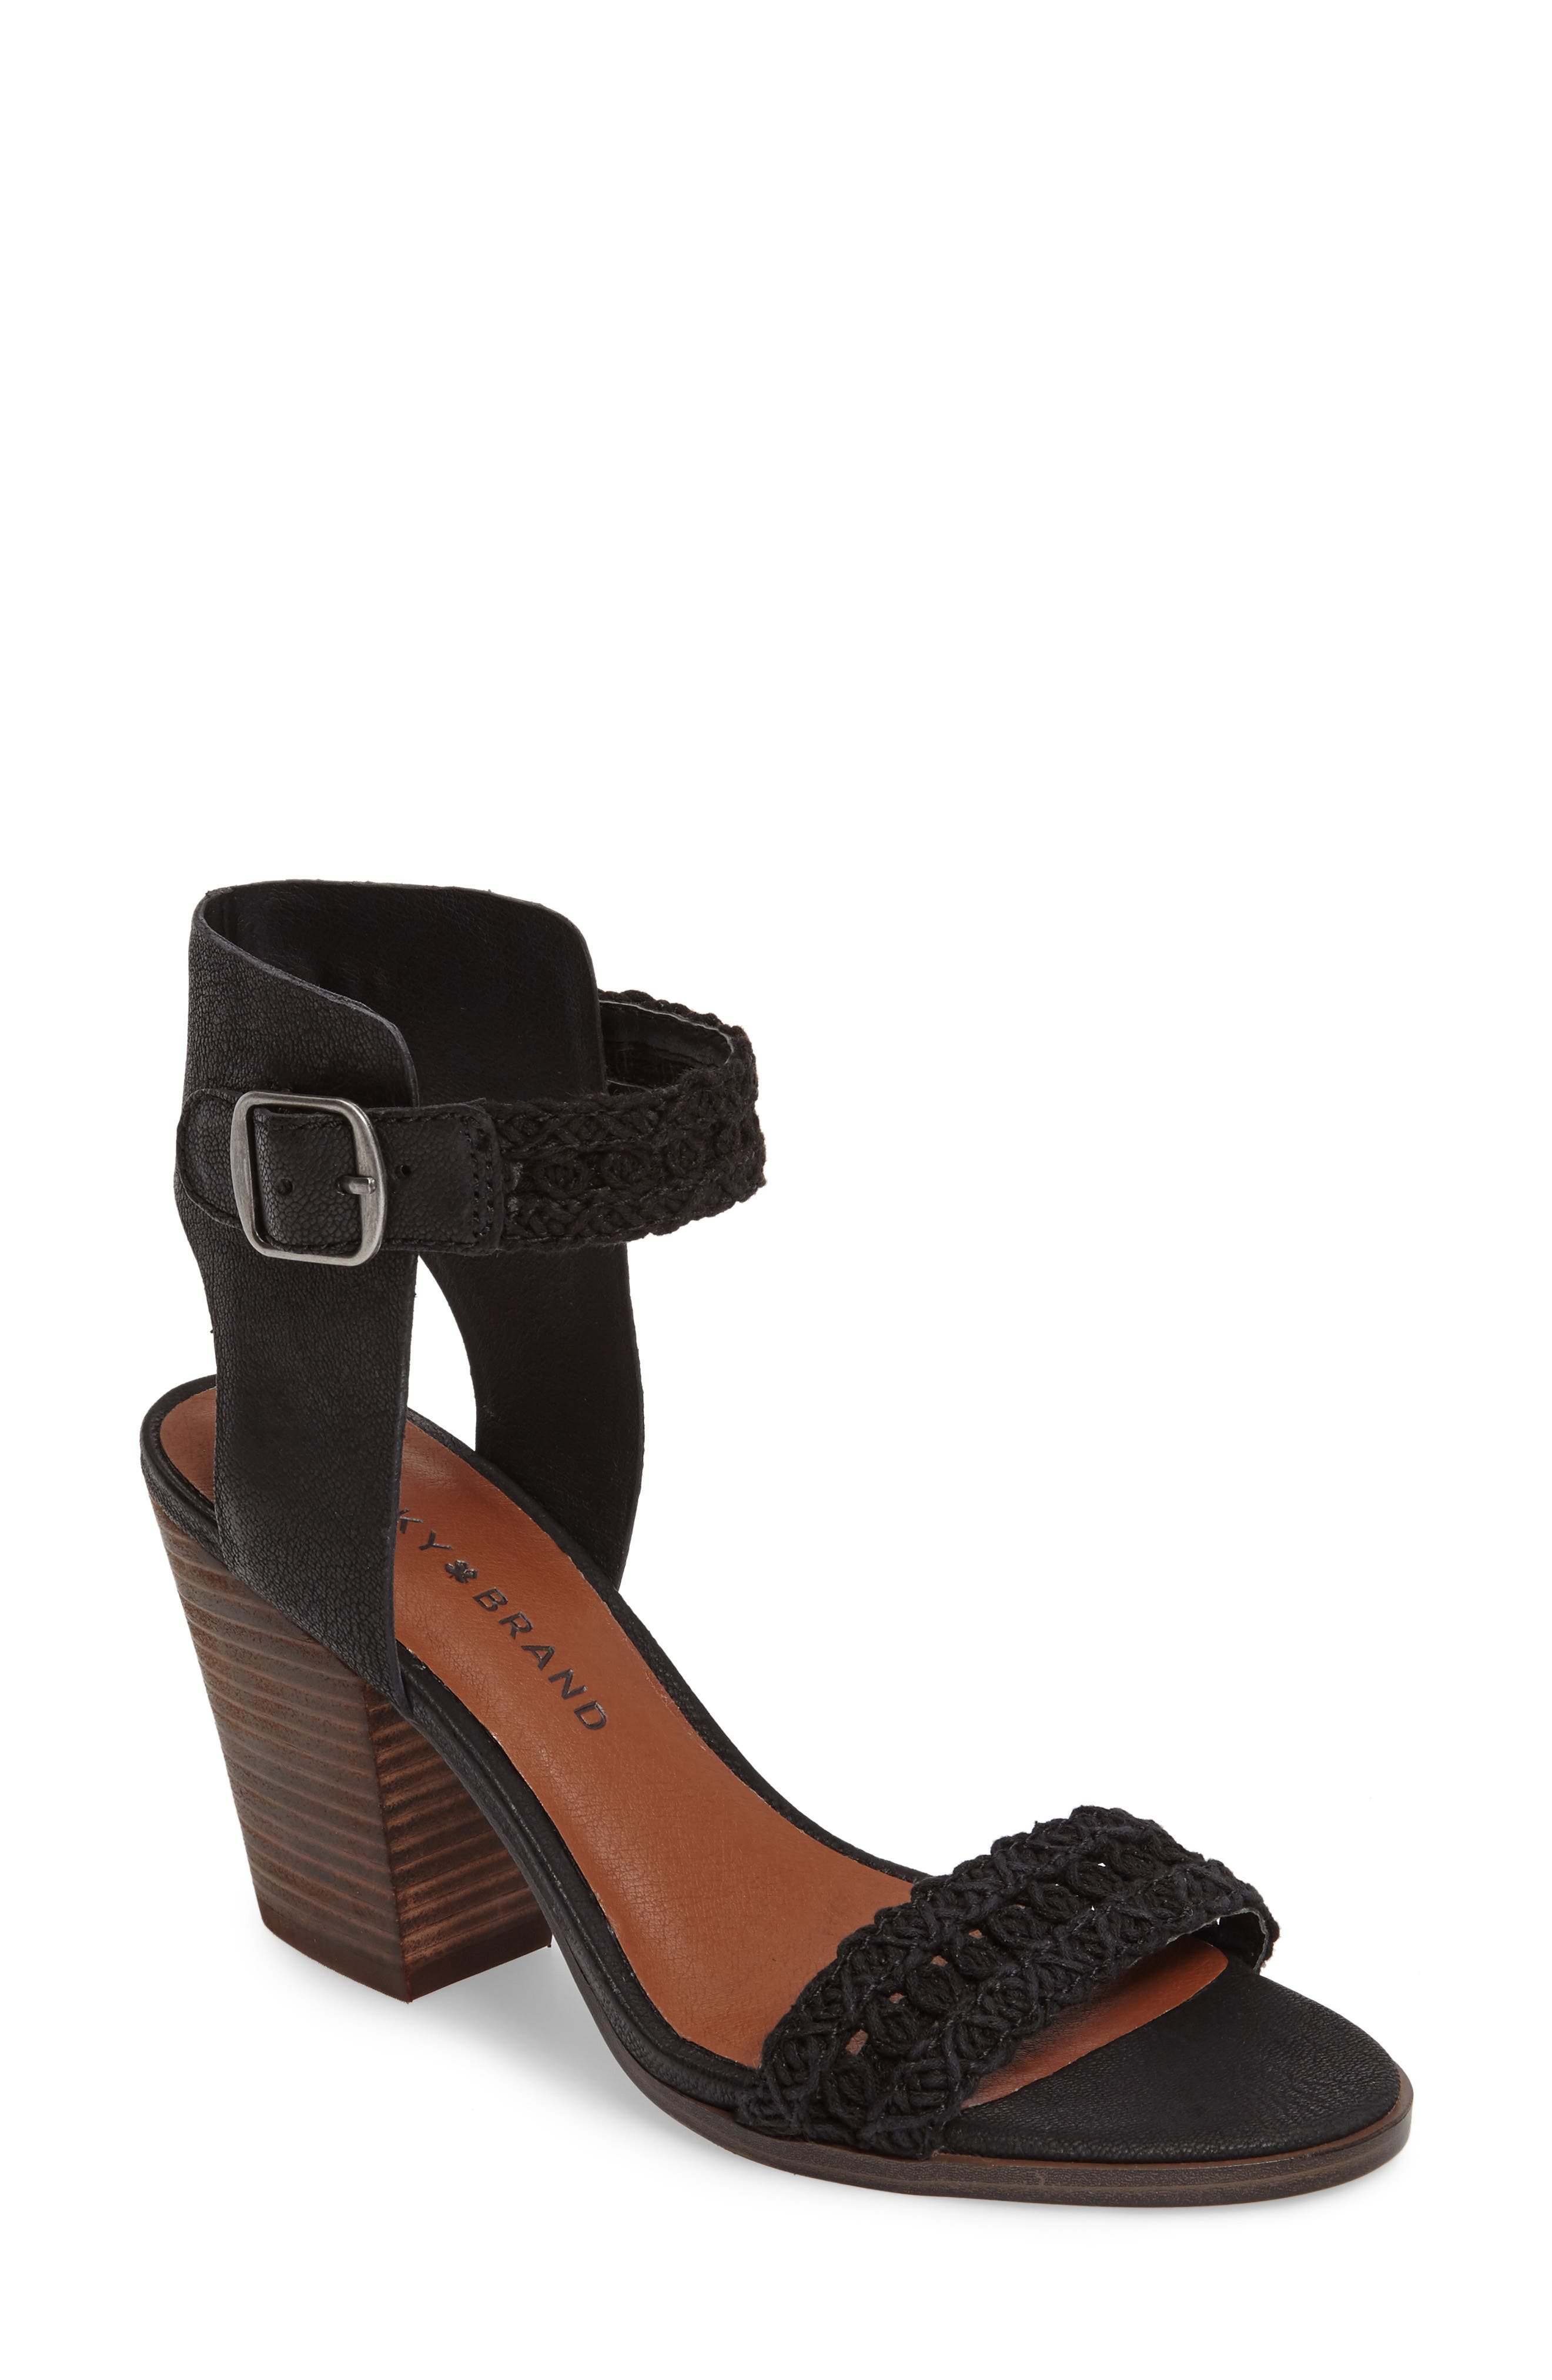 Oakes Ankle Strap Sandal,                             Main thumbnail 1, color,                             001